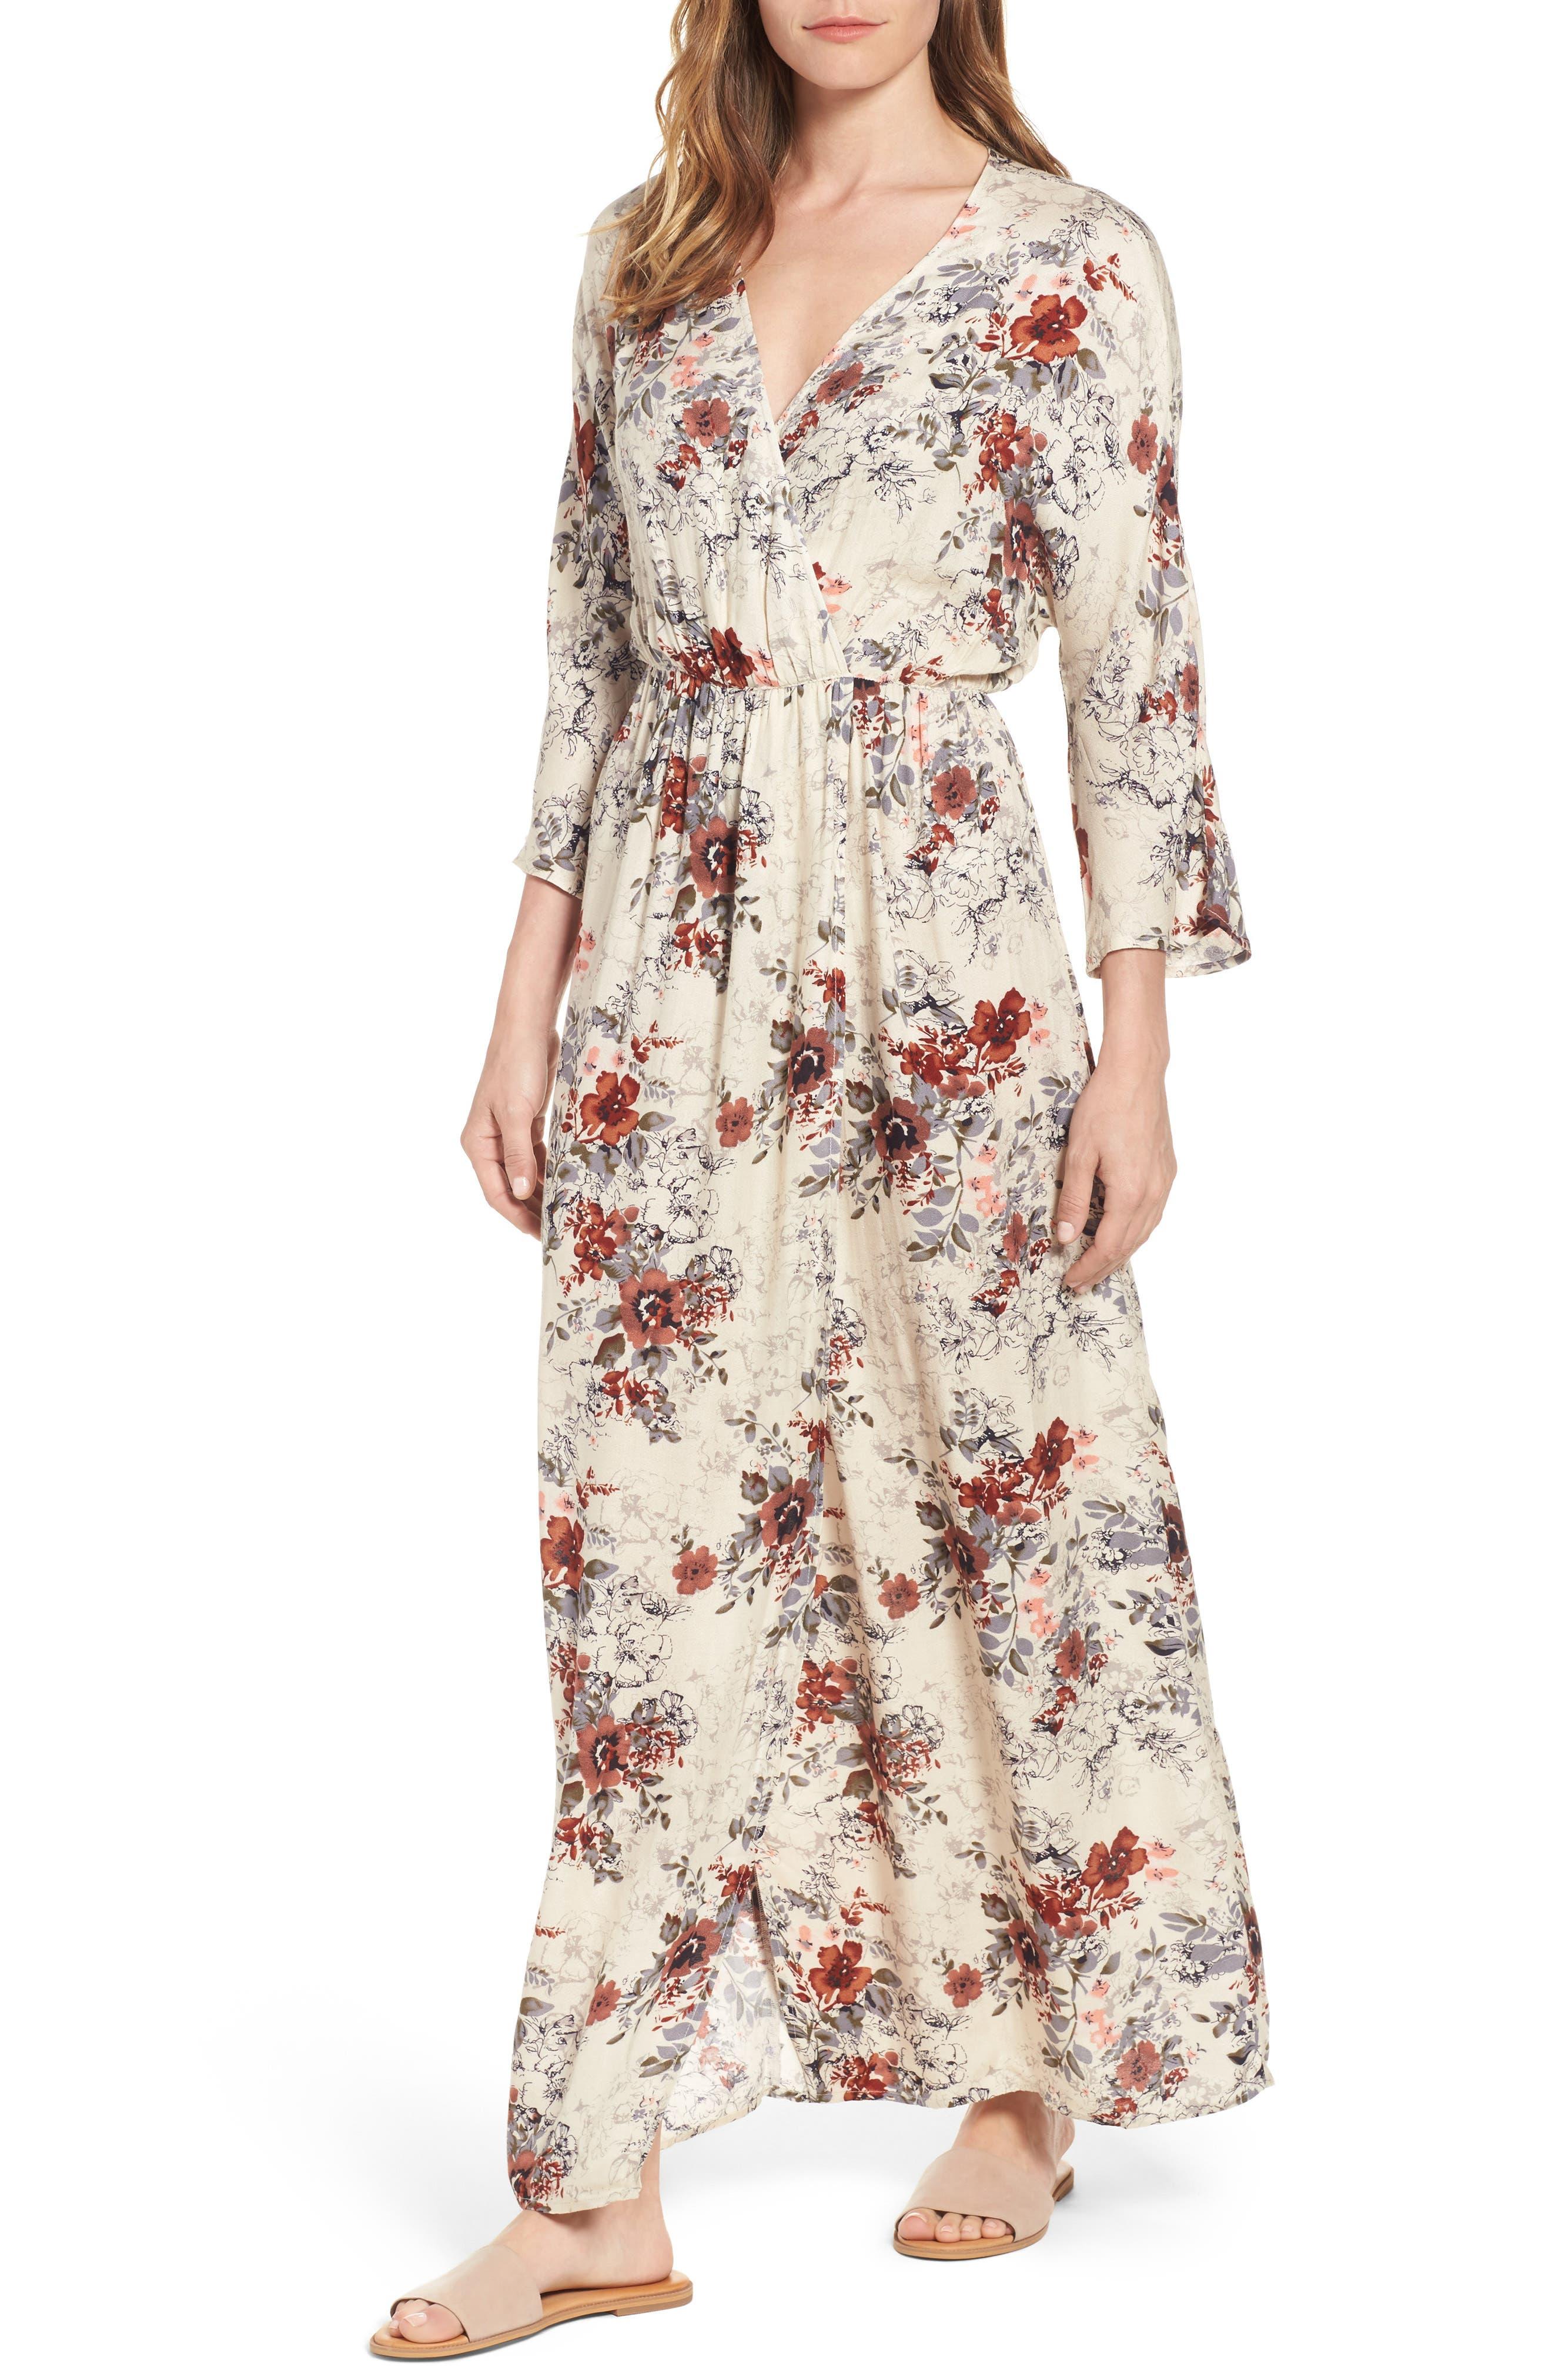 Alternate Image 1 Selected - Hinge Blouson Maxi Dress